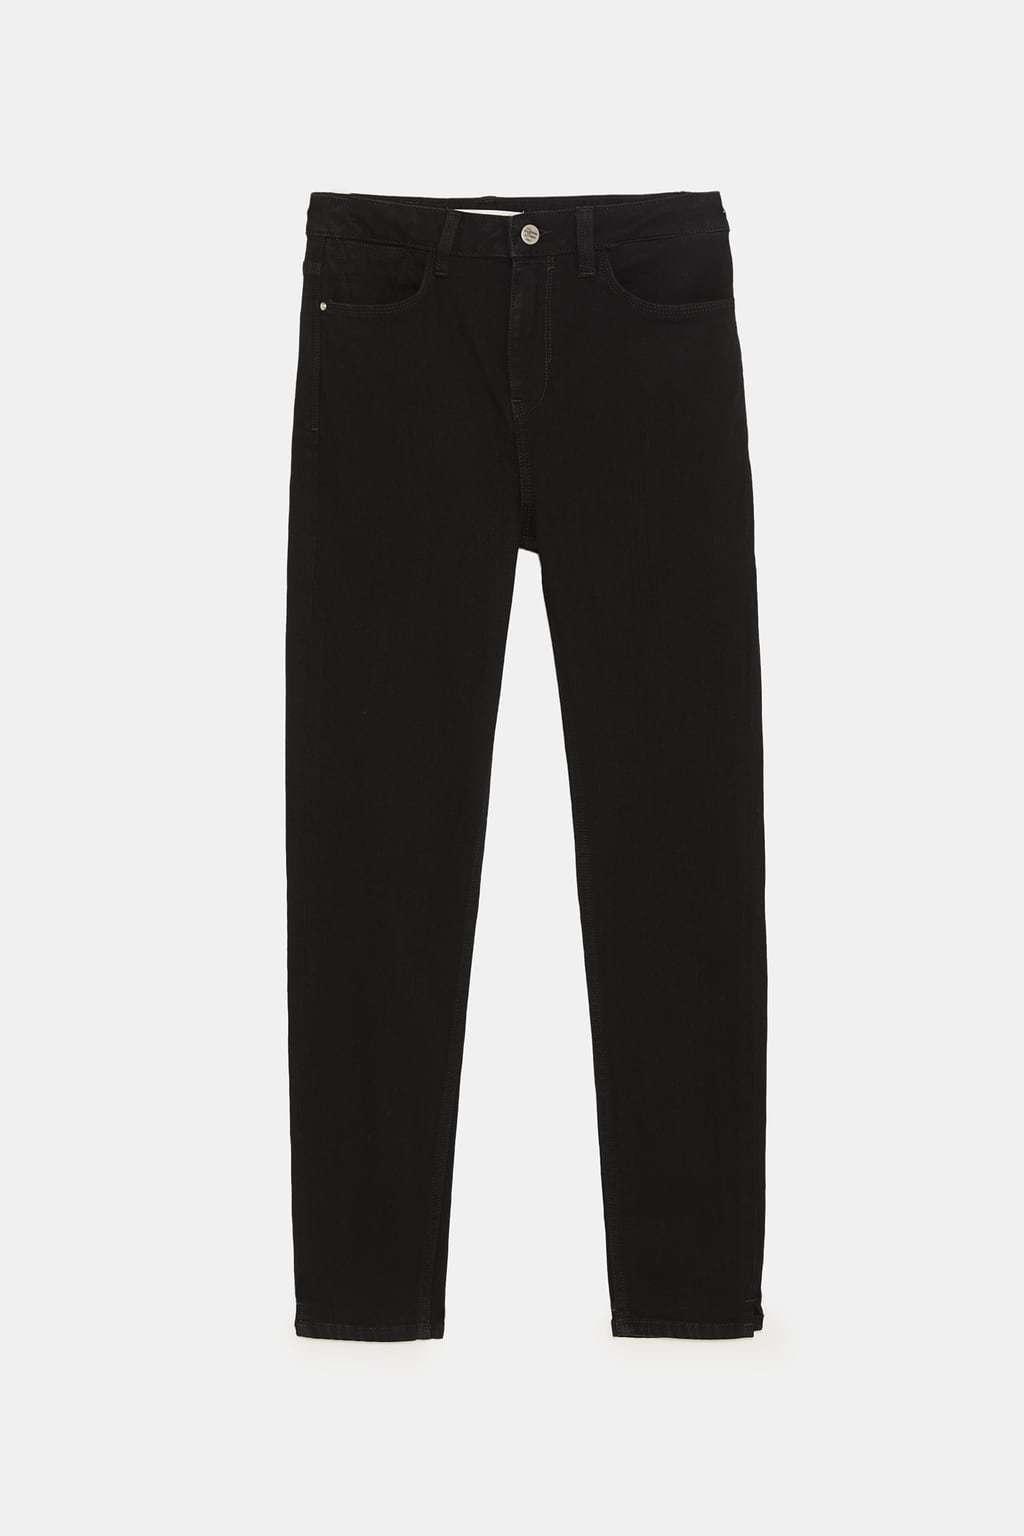 Jeans tiro alto color negro (25,95 euros).